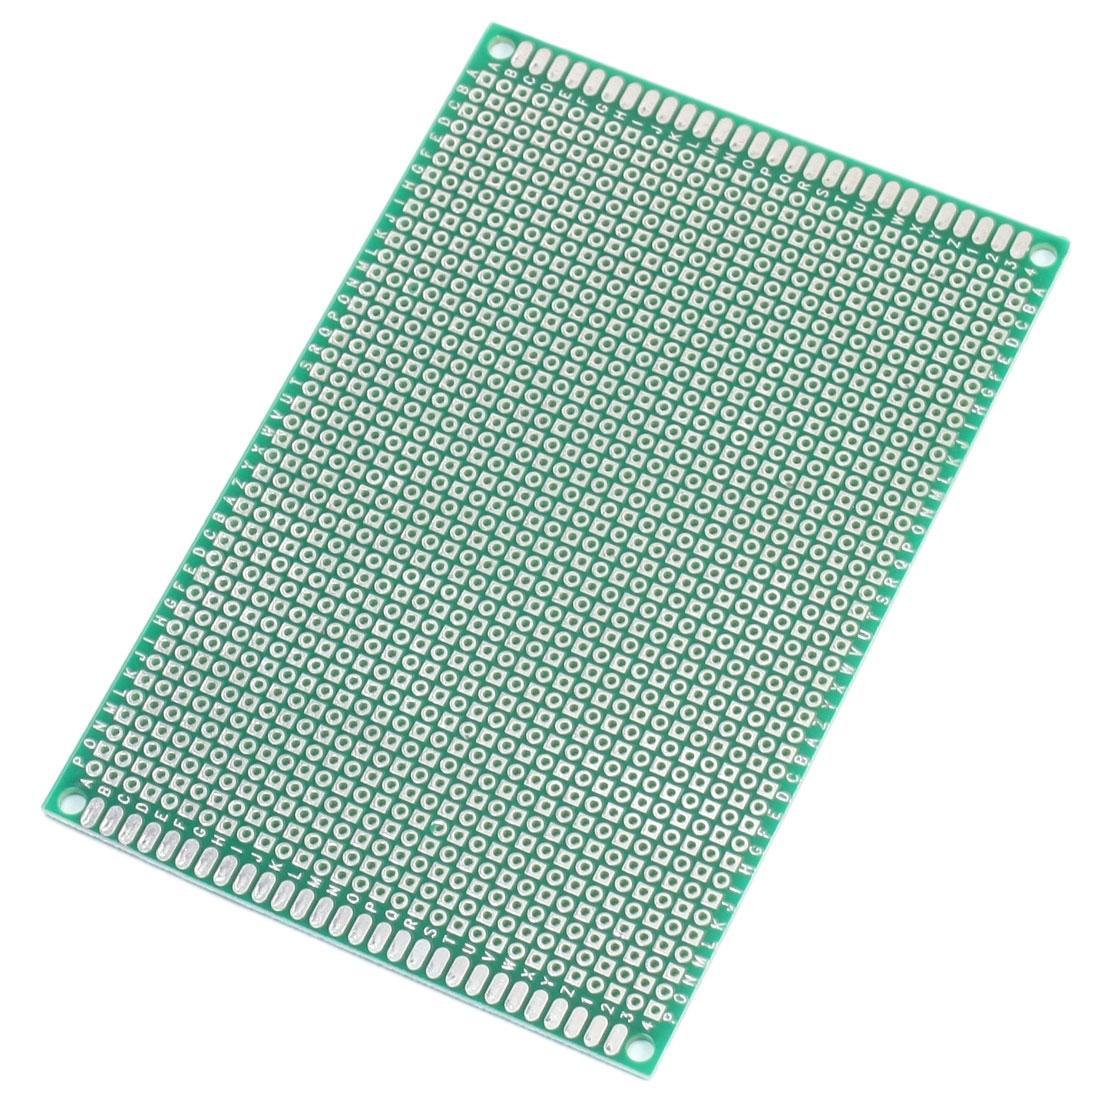 DIY Single Side Prototyping Experiment Matrix PCB Circuit Board 8x12cm